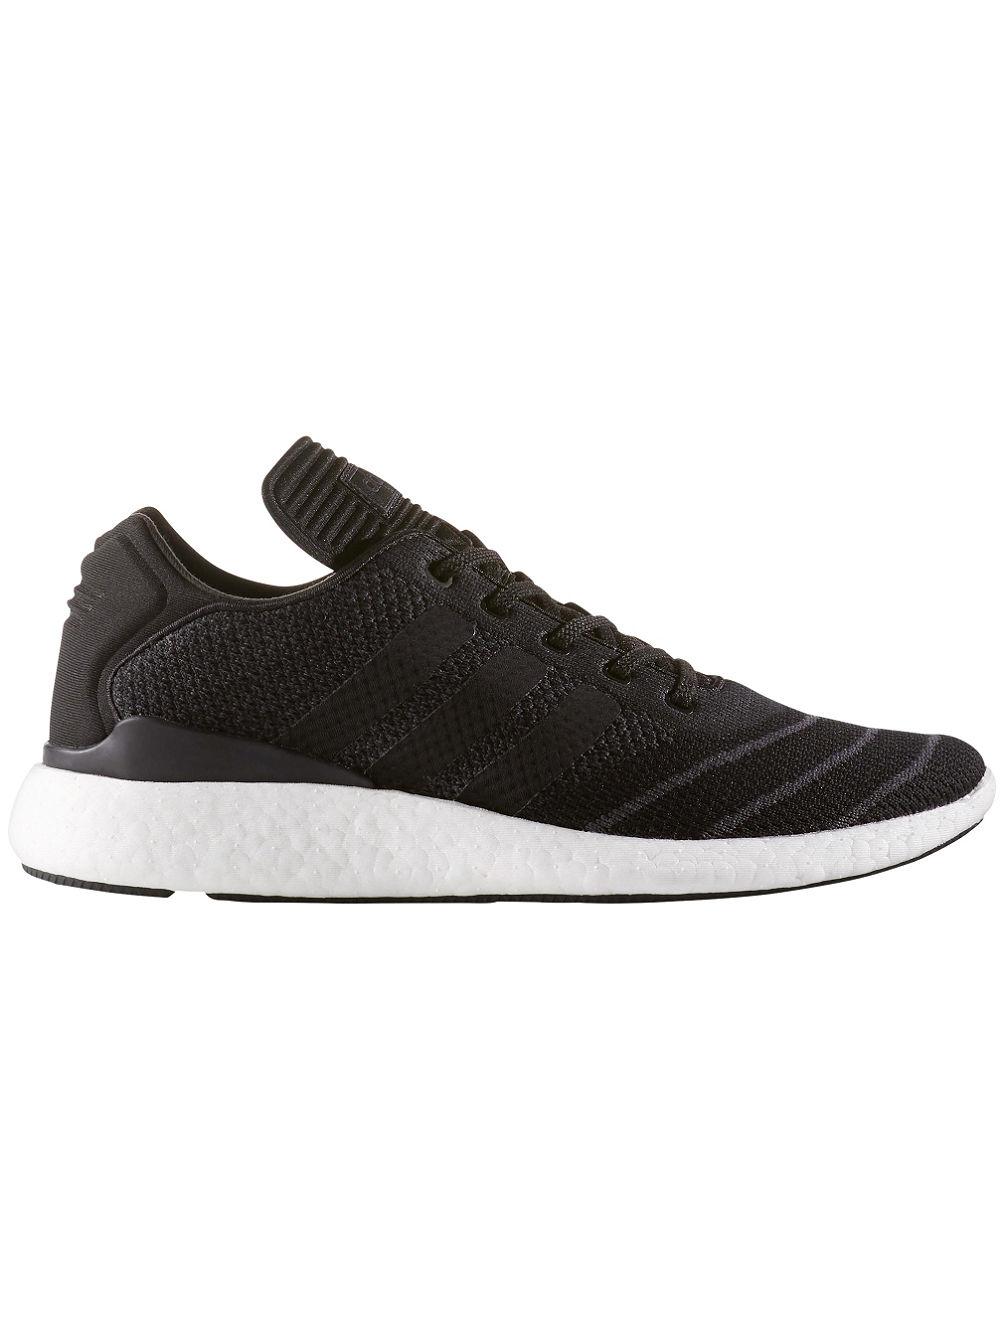 Adidas skate shoes zumiez - Busenitz Pure Boost Primeknit Skate Shoes Adidas Skateboarding